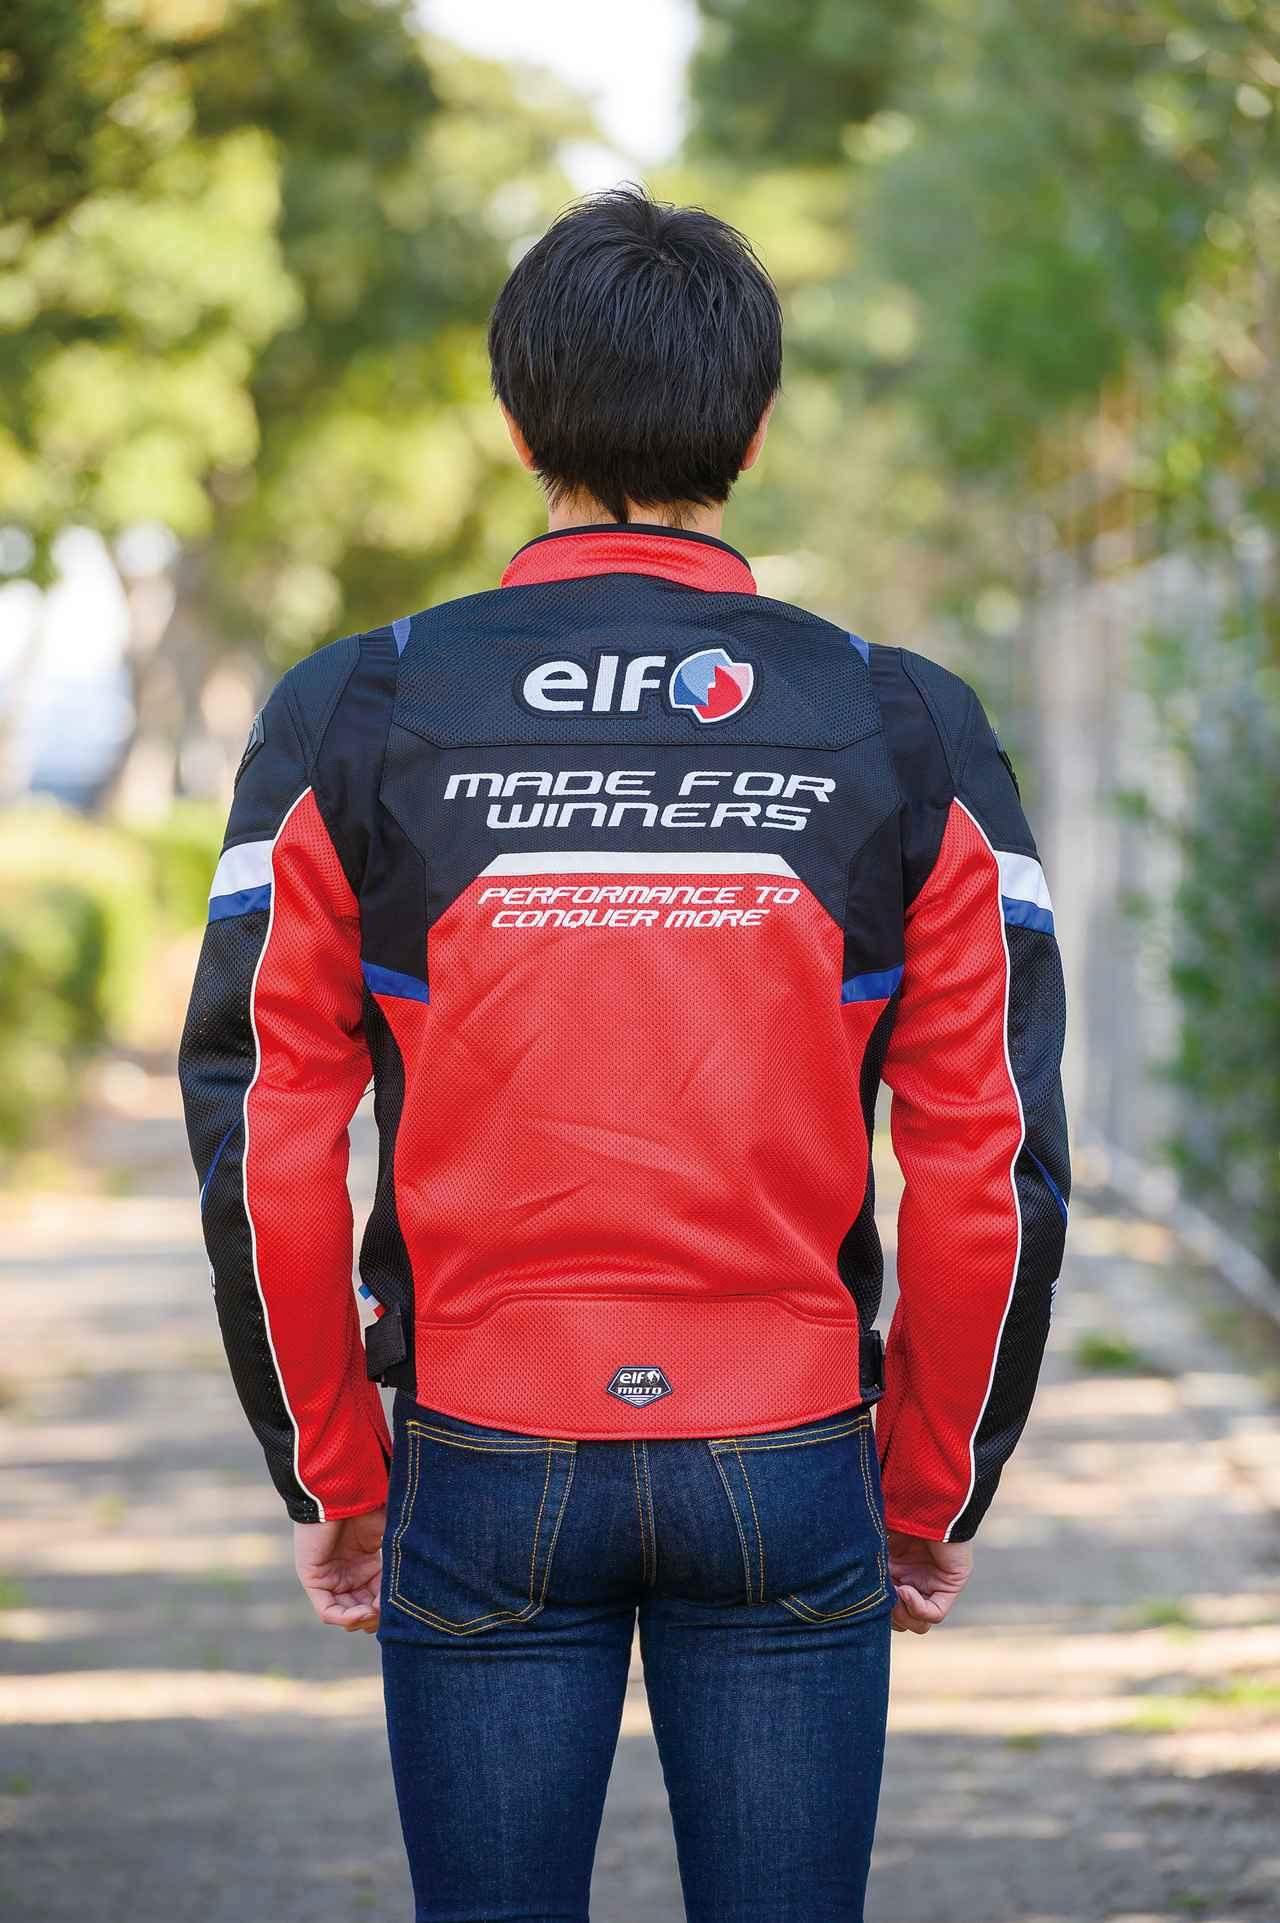 Images : 3番目の画像 - 「エルフの新作ウェアをチェック!「エボルツィオーネメッシュジャケット」【2021年夏ジャケット図鑑】」のアルバム - webオートバイ